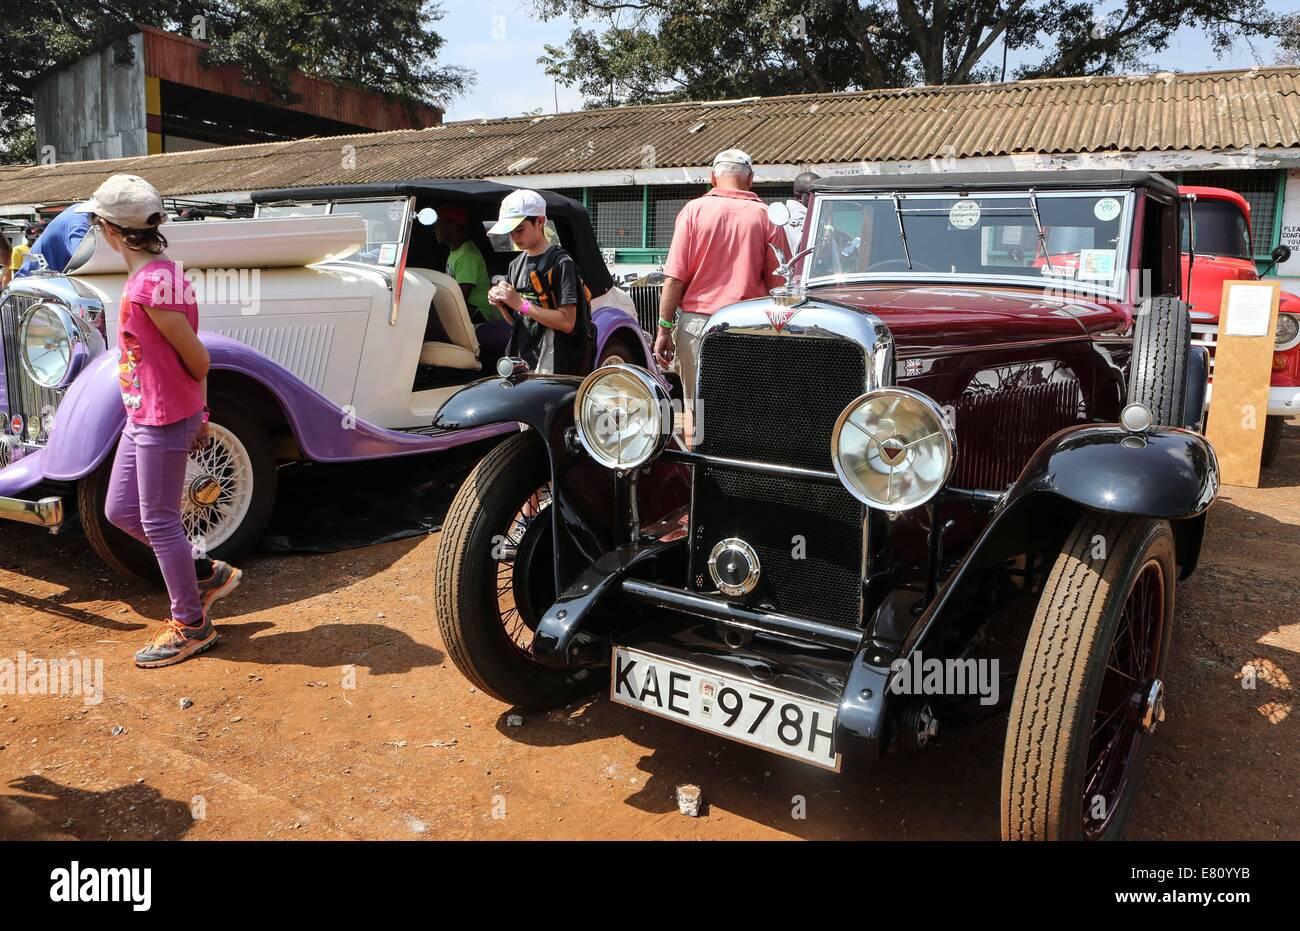 Nairobi, Kenya. 28th Sep, 2014. Visitors admire vintage cars during ...